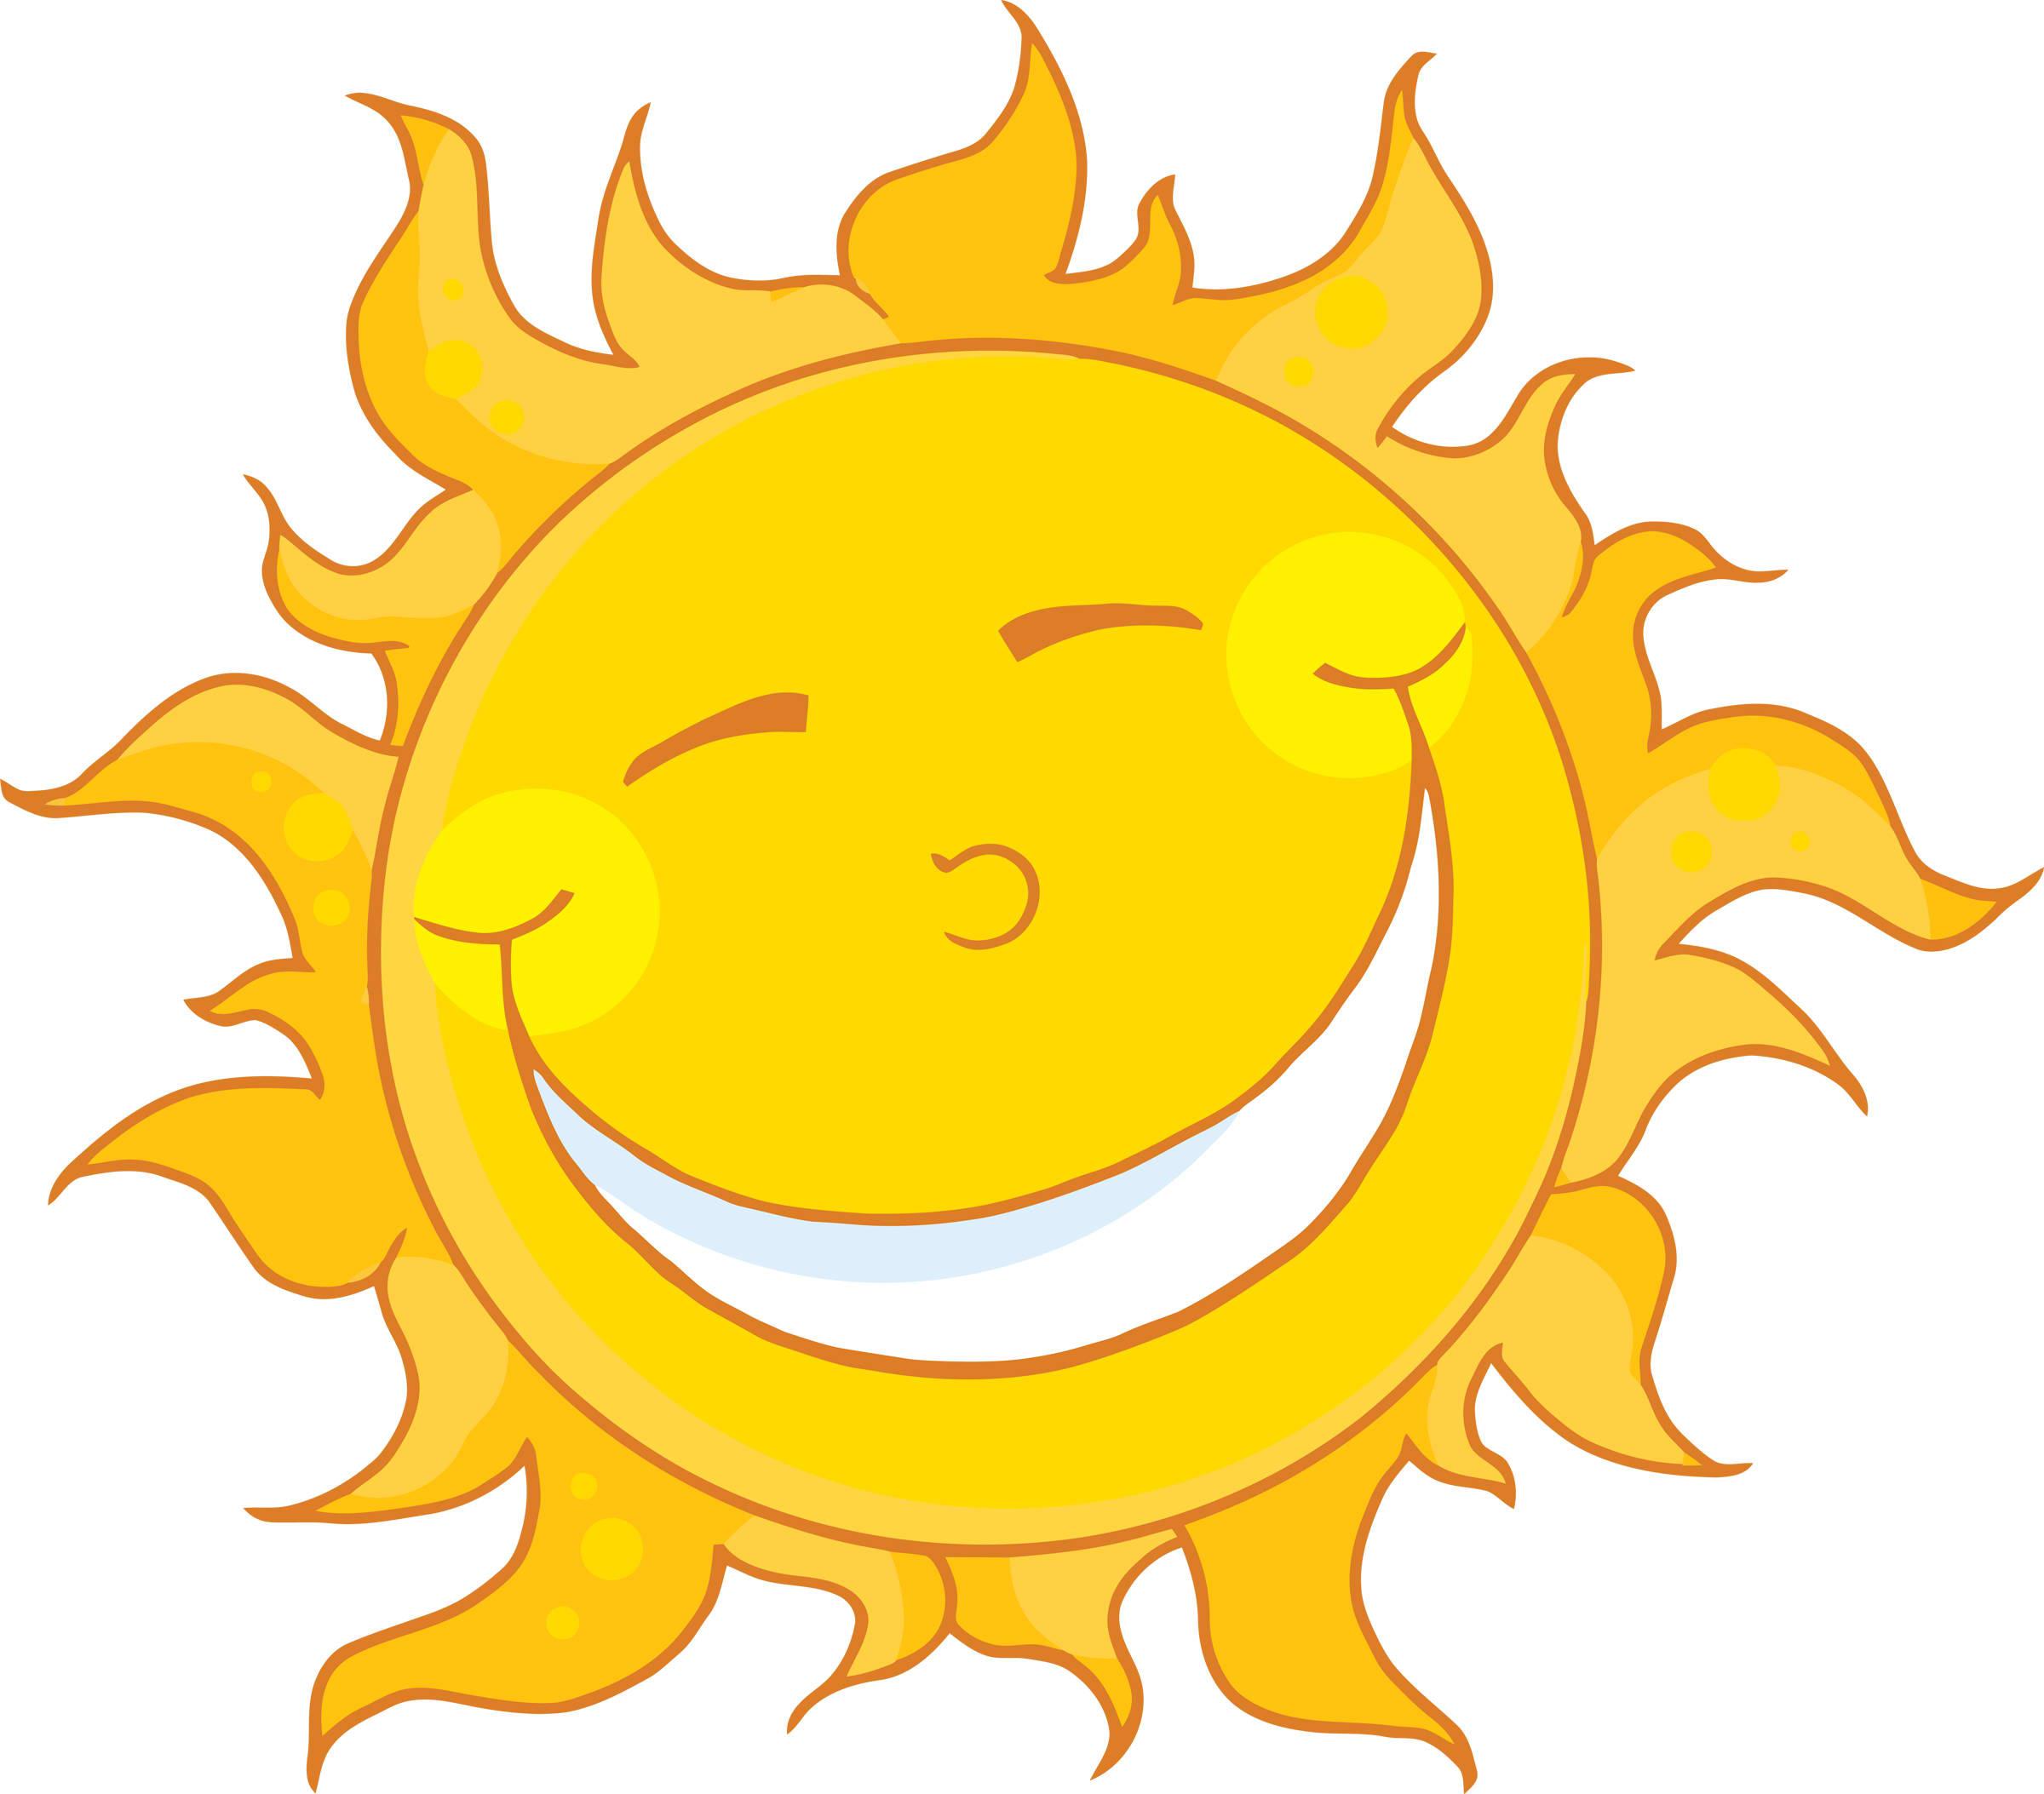 Sun with sunglasses happy face sun clipart